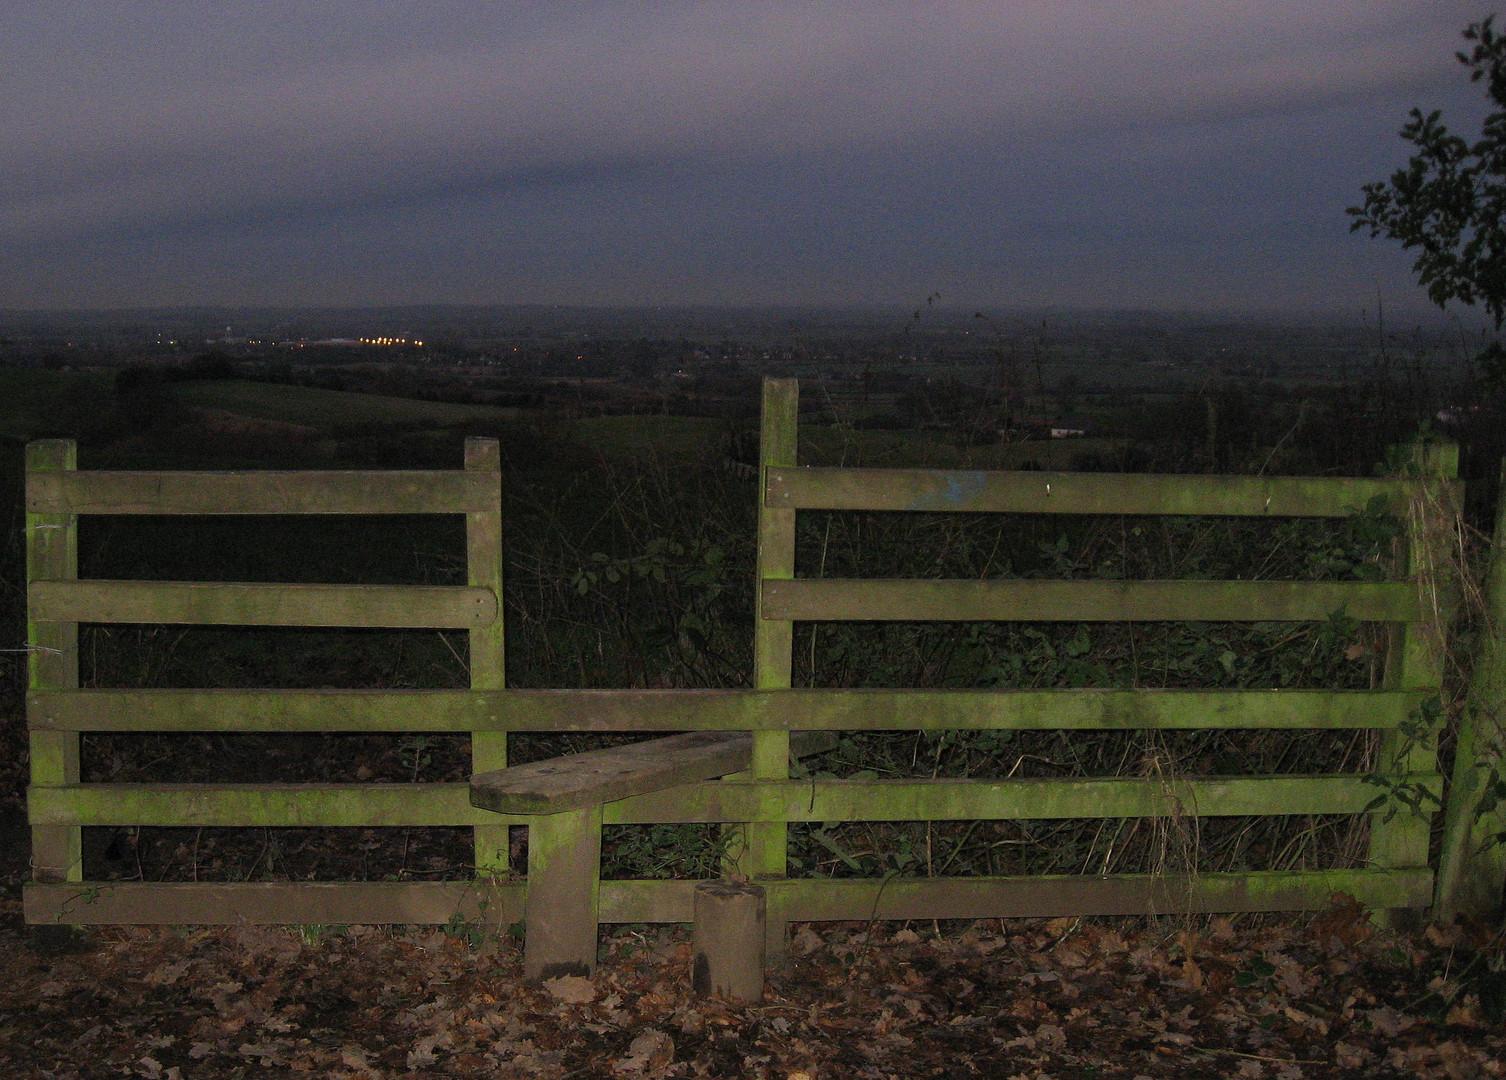 Dusk, a gateway to home